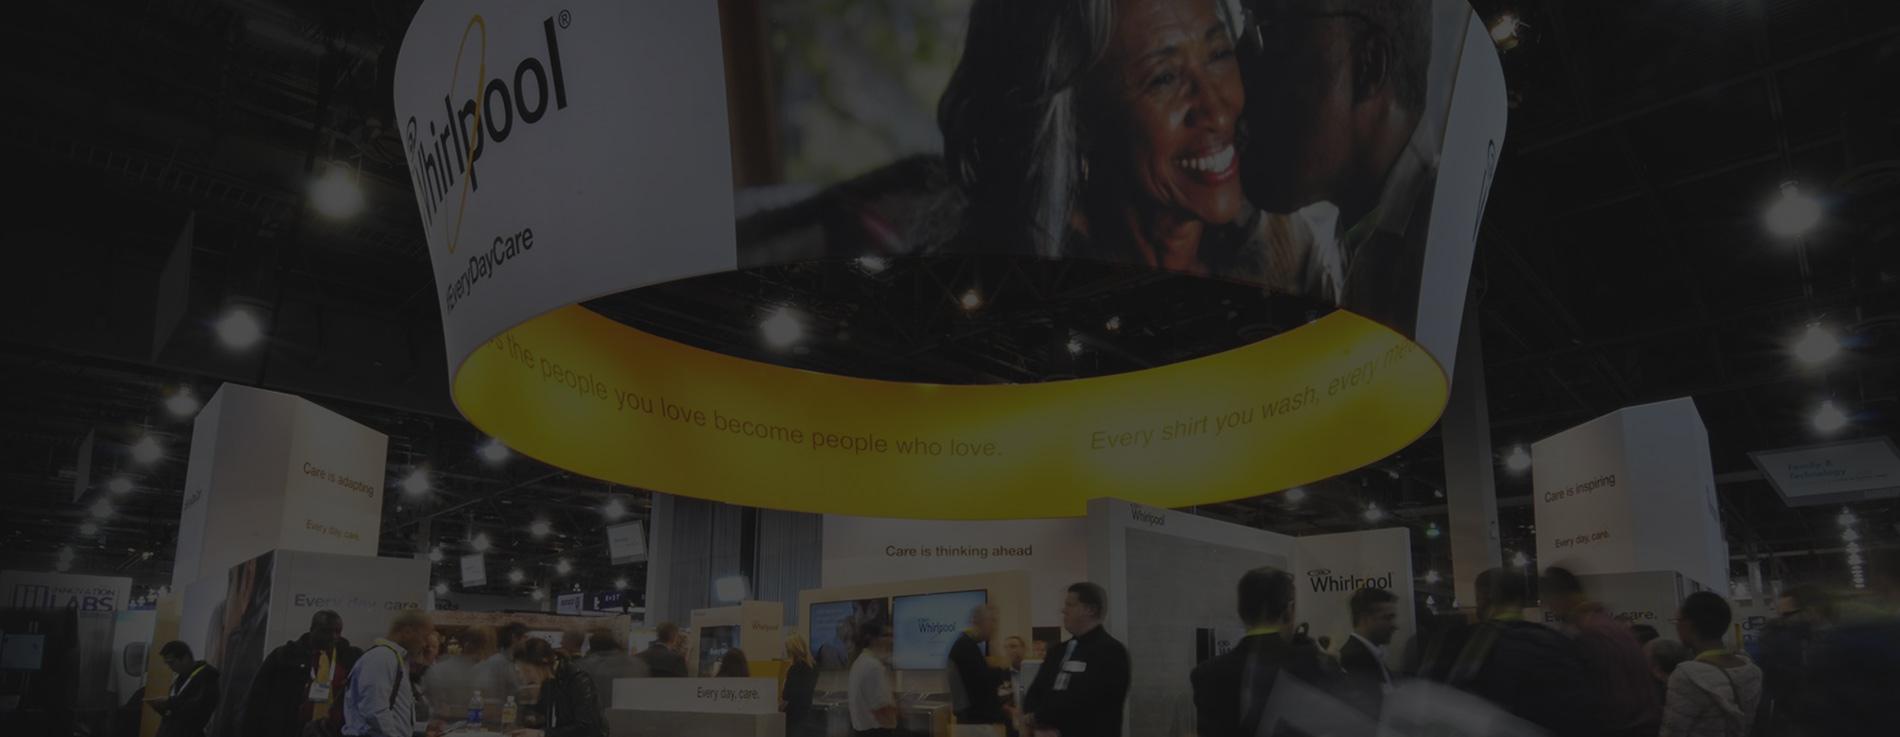 InterGlobal Exhibits